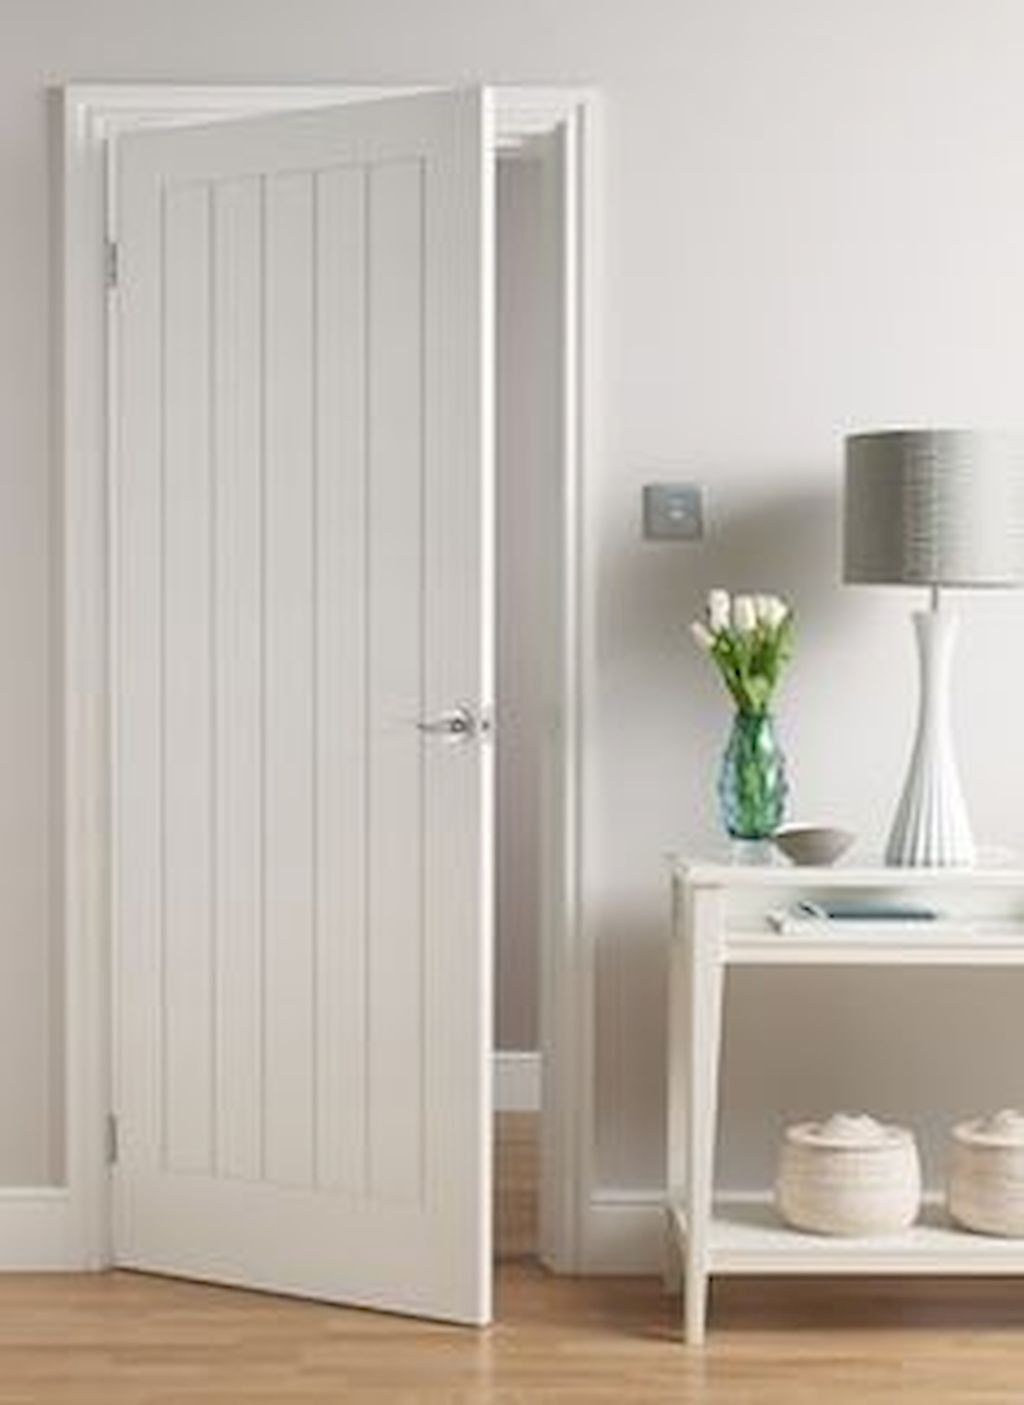 Arvika Polar White Modern Interior Door Scandinavian Style Flat Solid Core Painted White Sound Proof 4 Horizontal Grooves Belldinni Doors Interior Modern Interior Door Styles Doors Interior